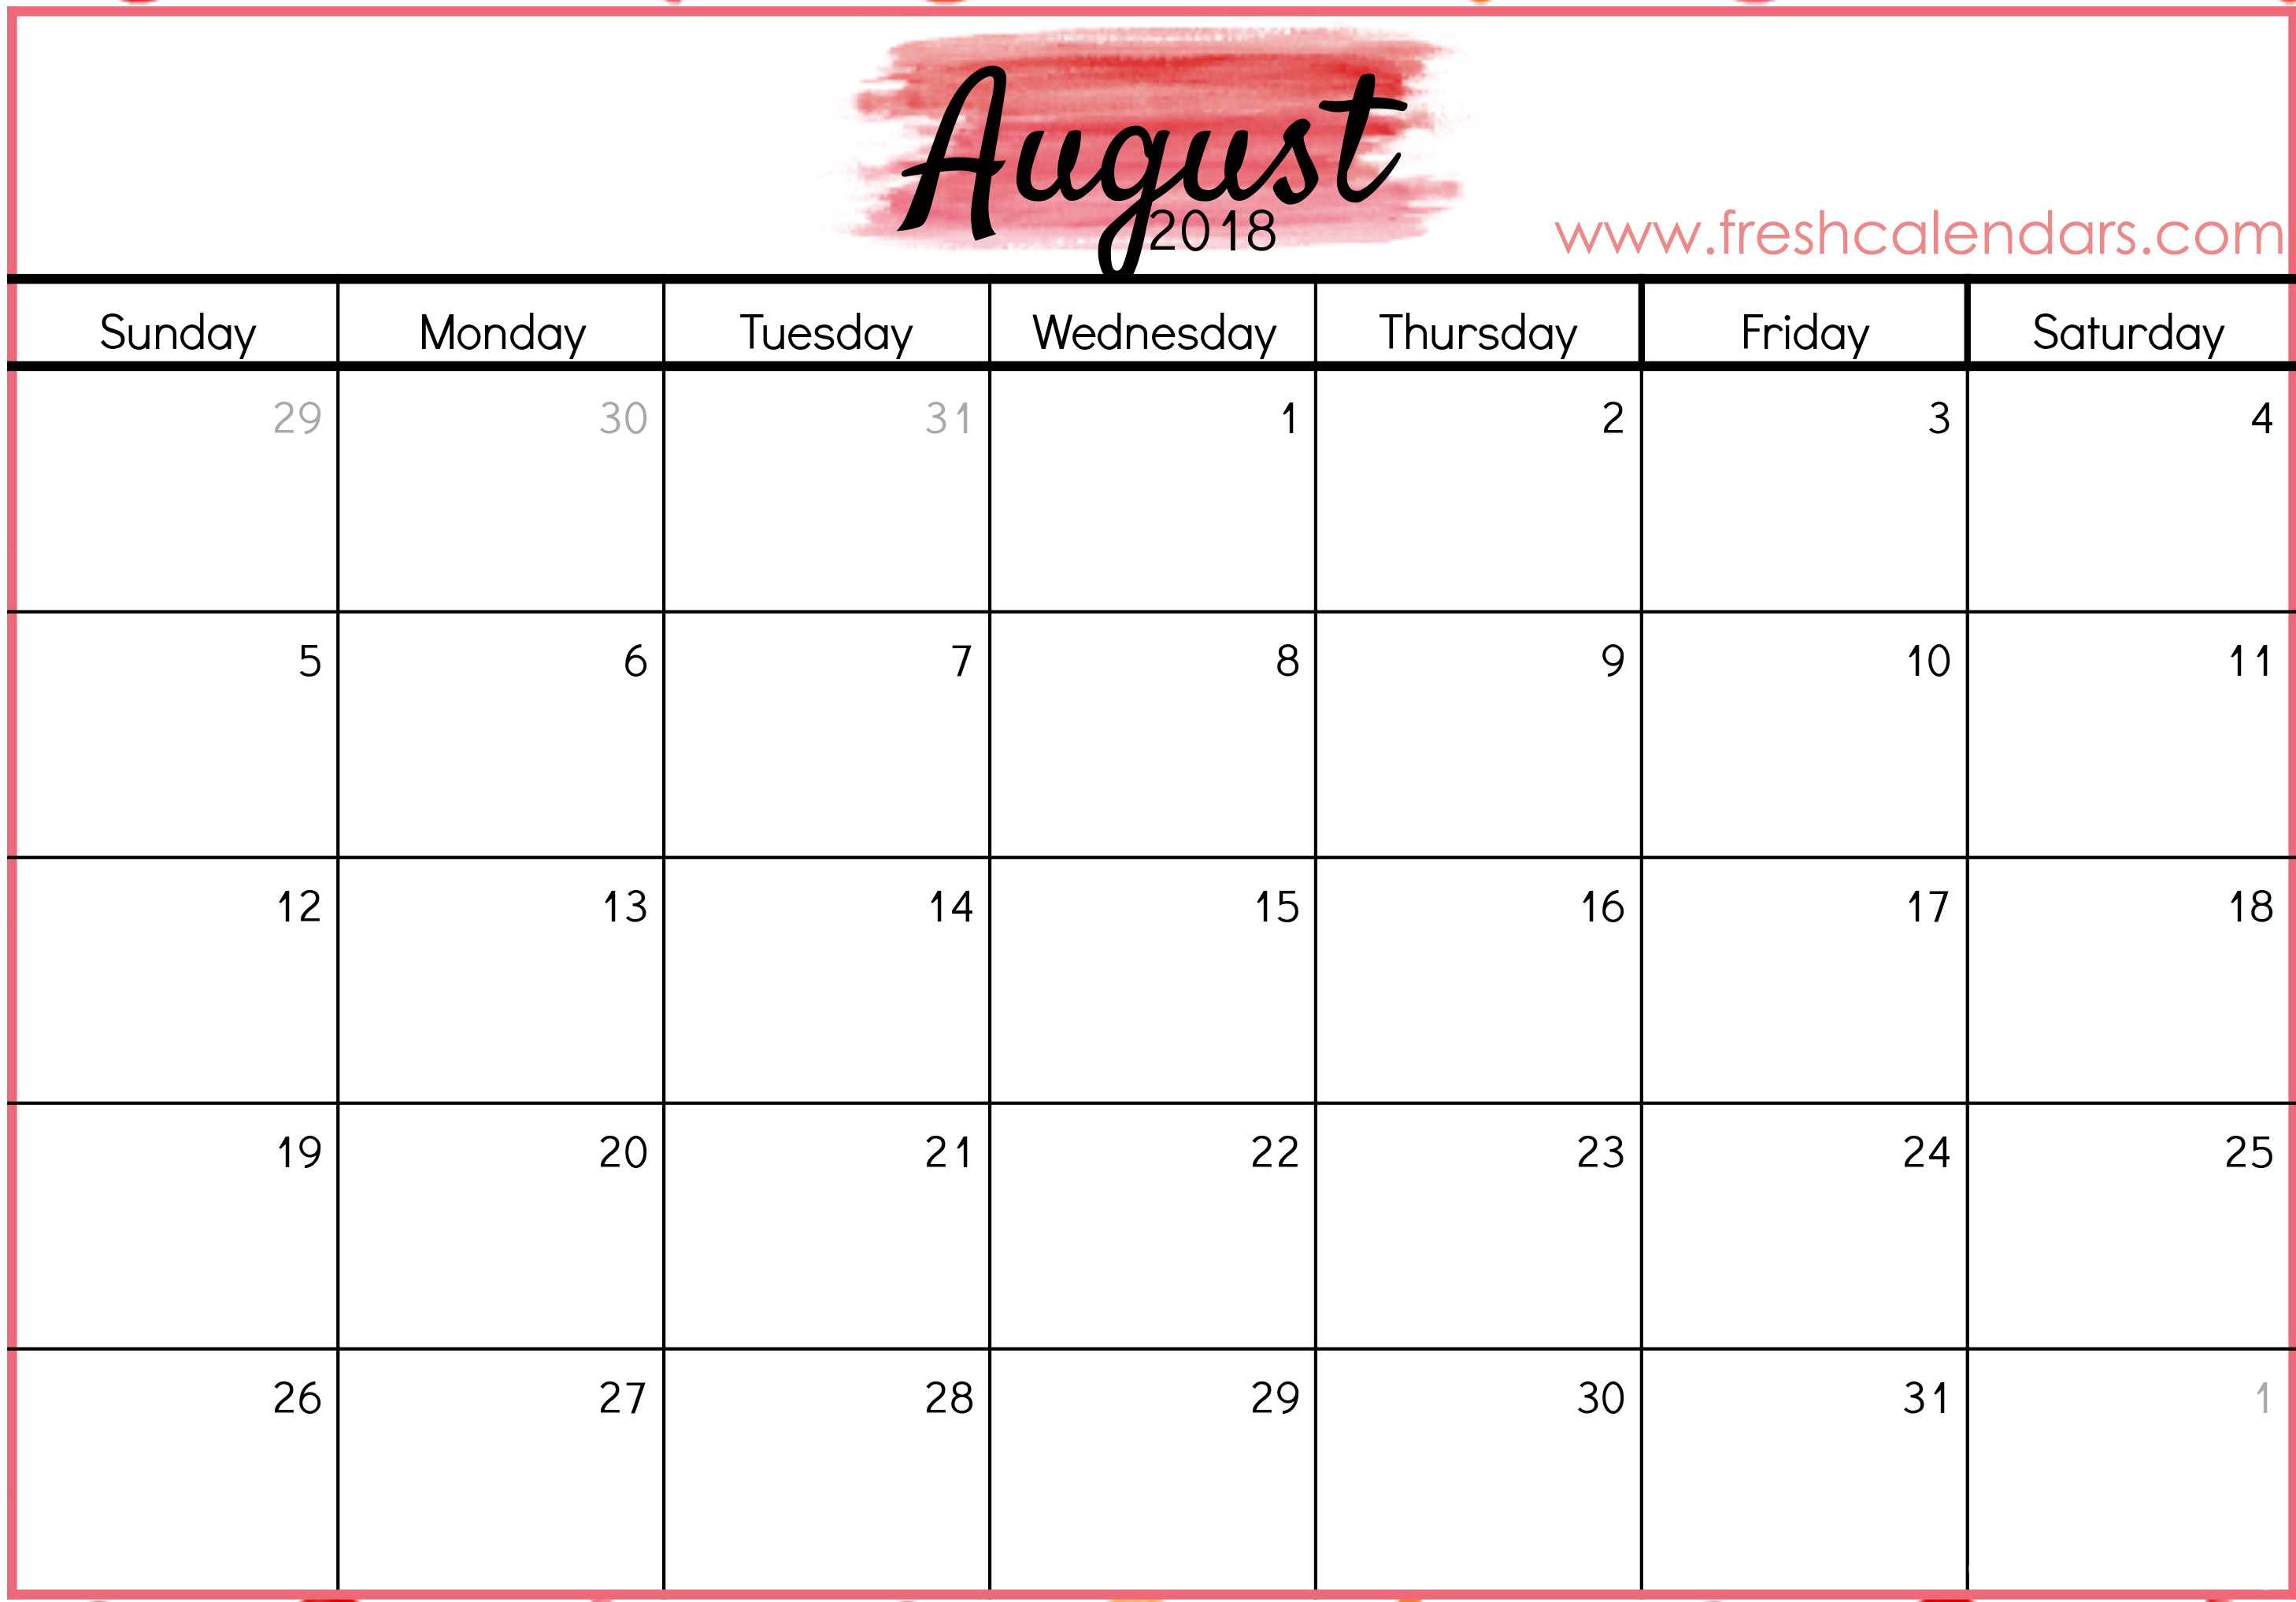 August 2018 Calendar Printable - Fresh Calendars intended for Blank August Colorful Calendar